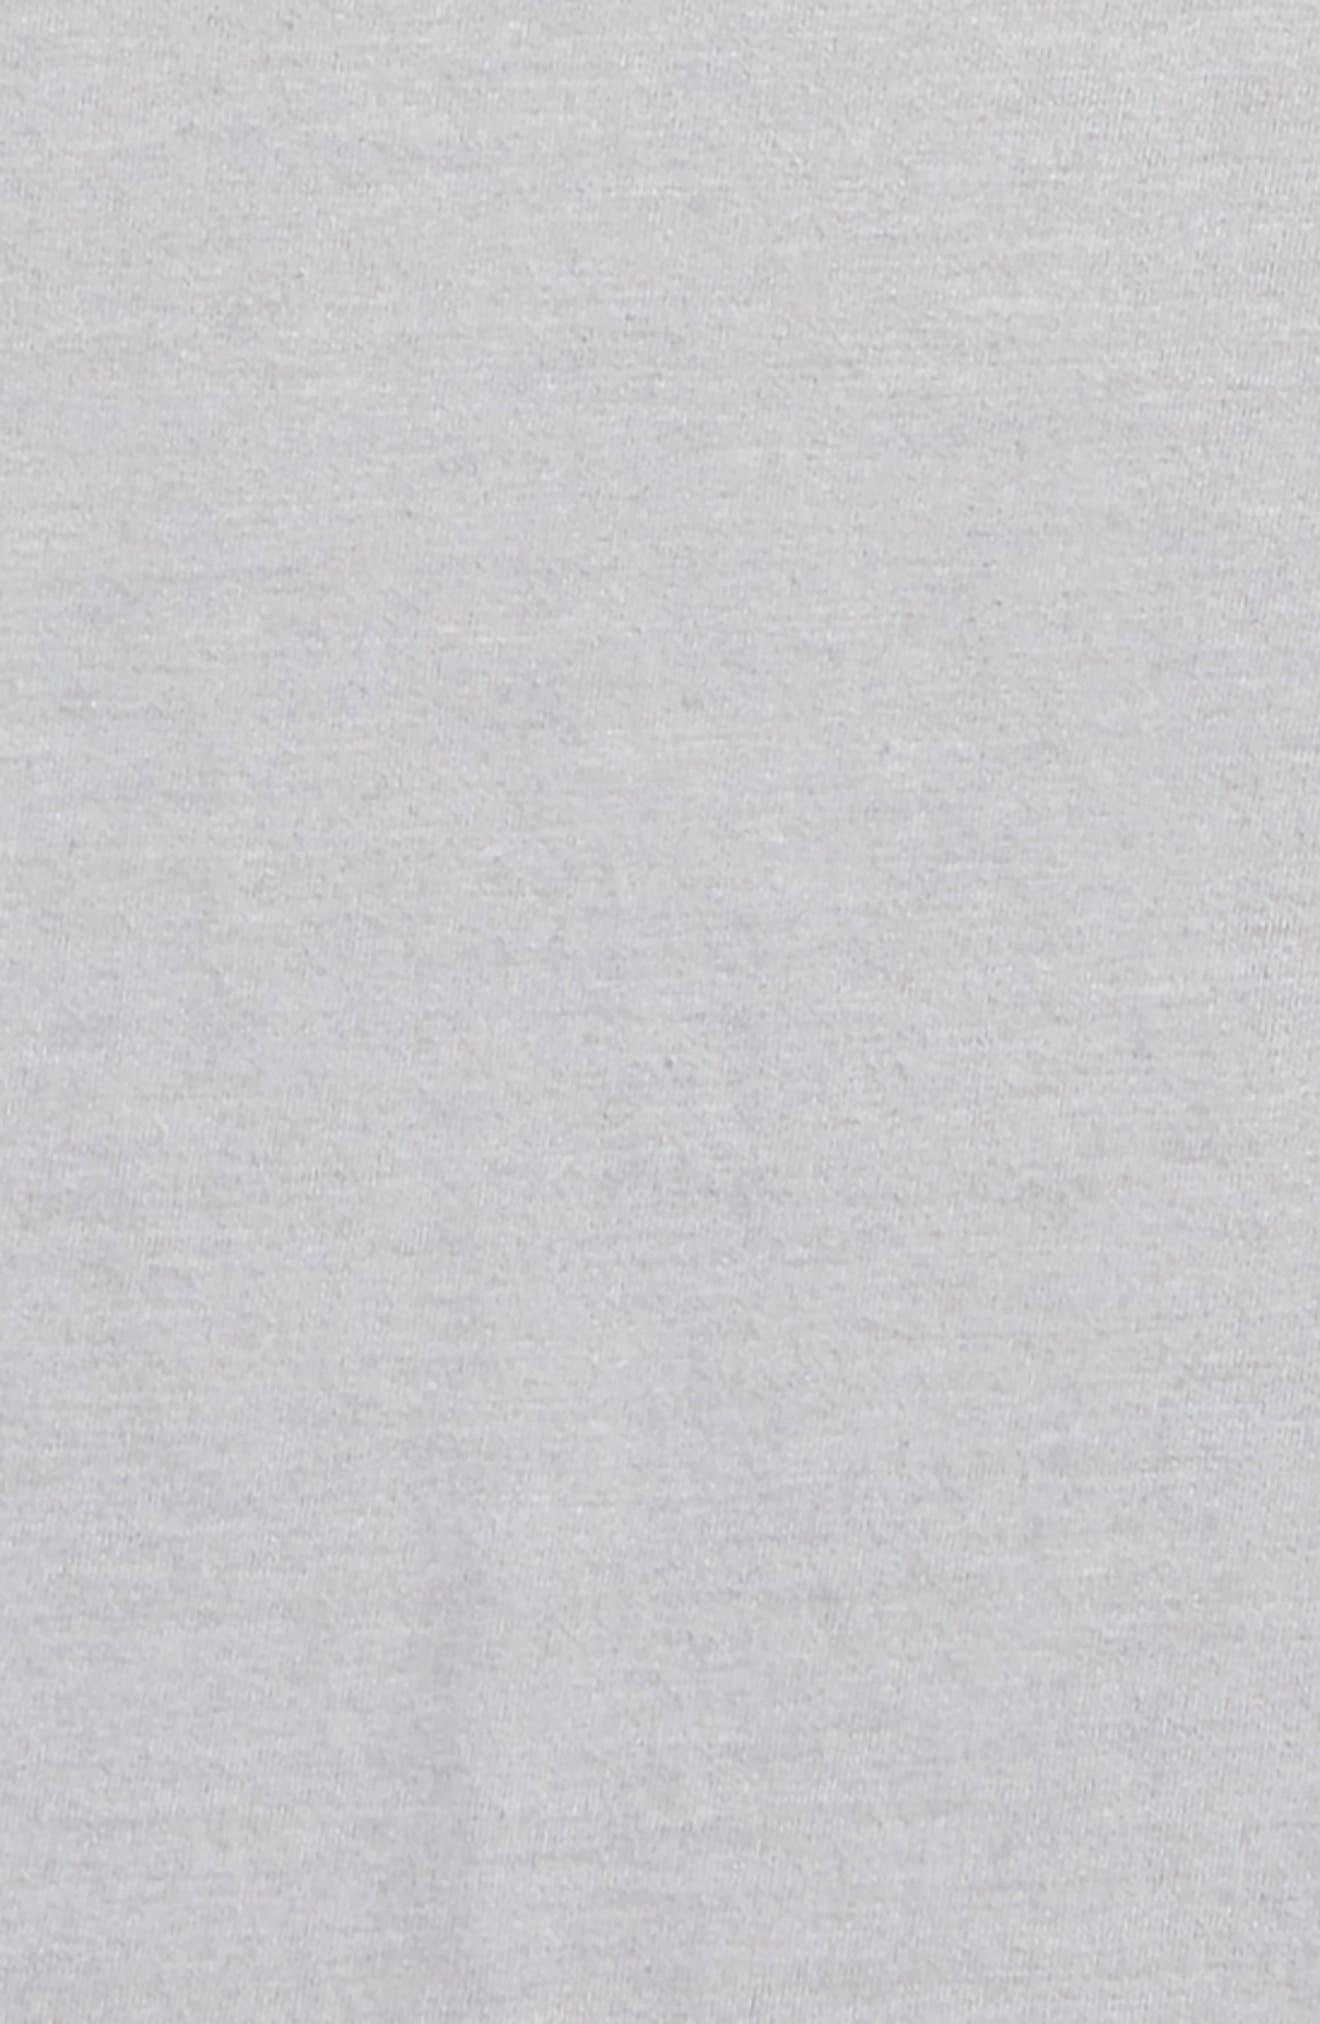 Colorblock Sleeve T-Shirt,                             Alternate thumbnail 2, color,                             050